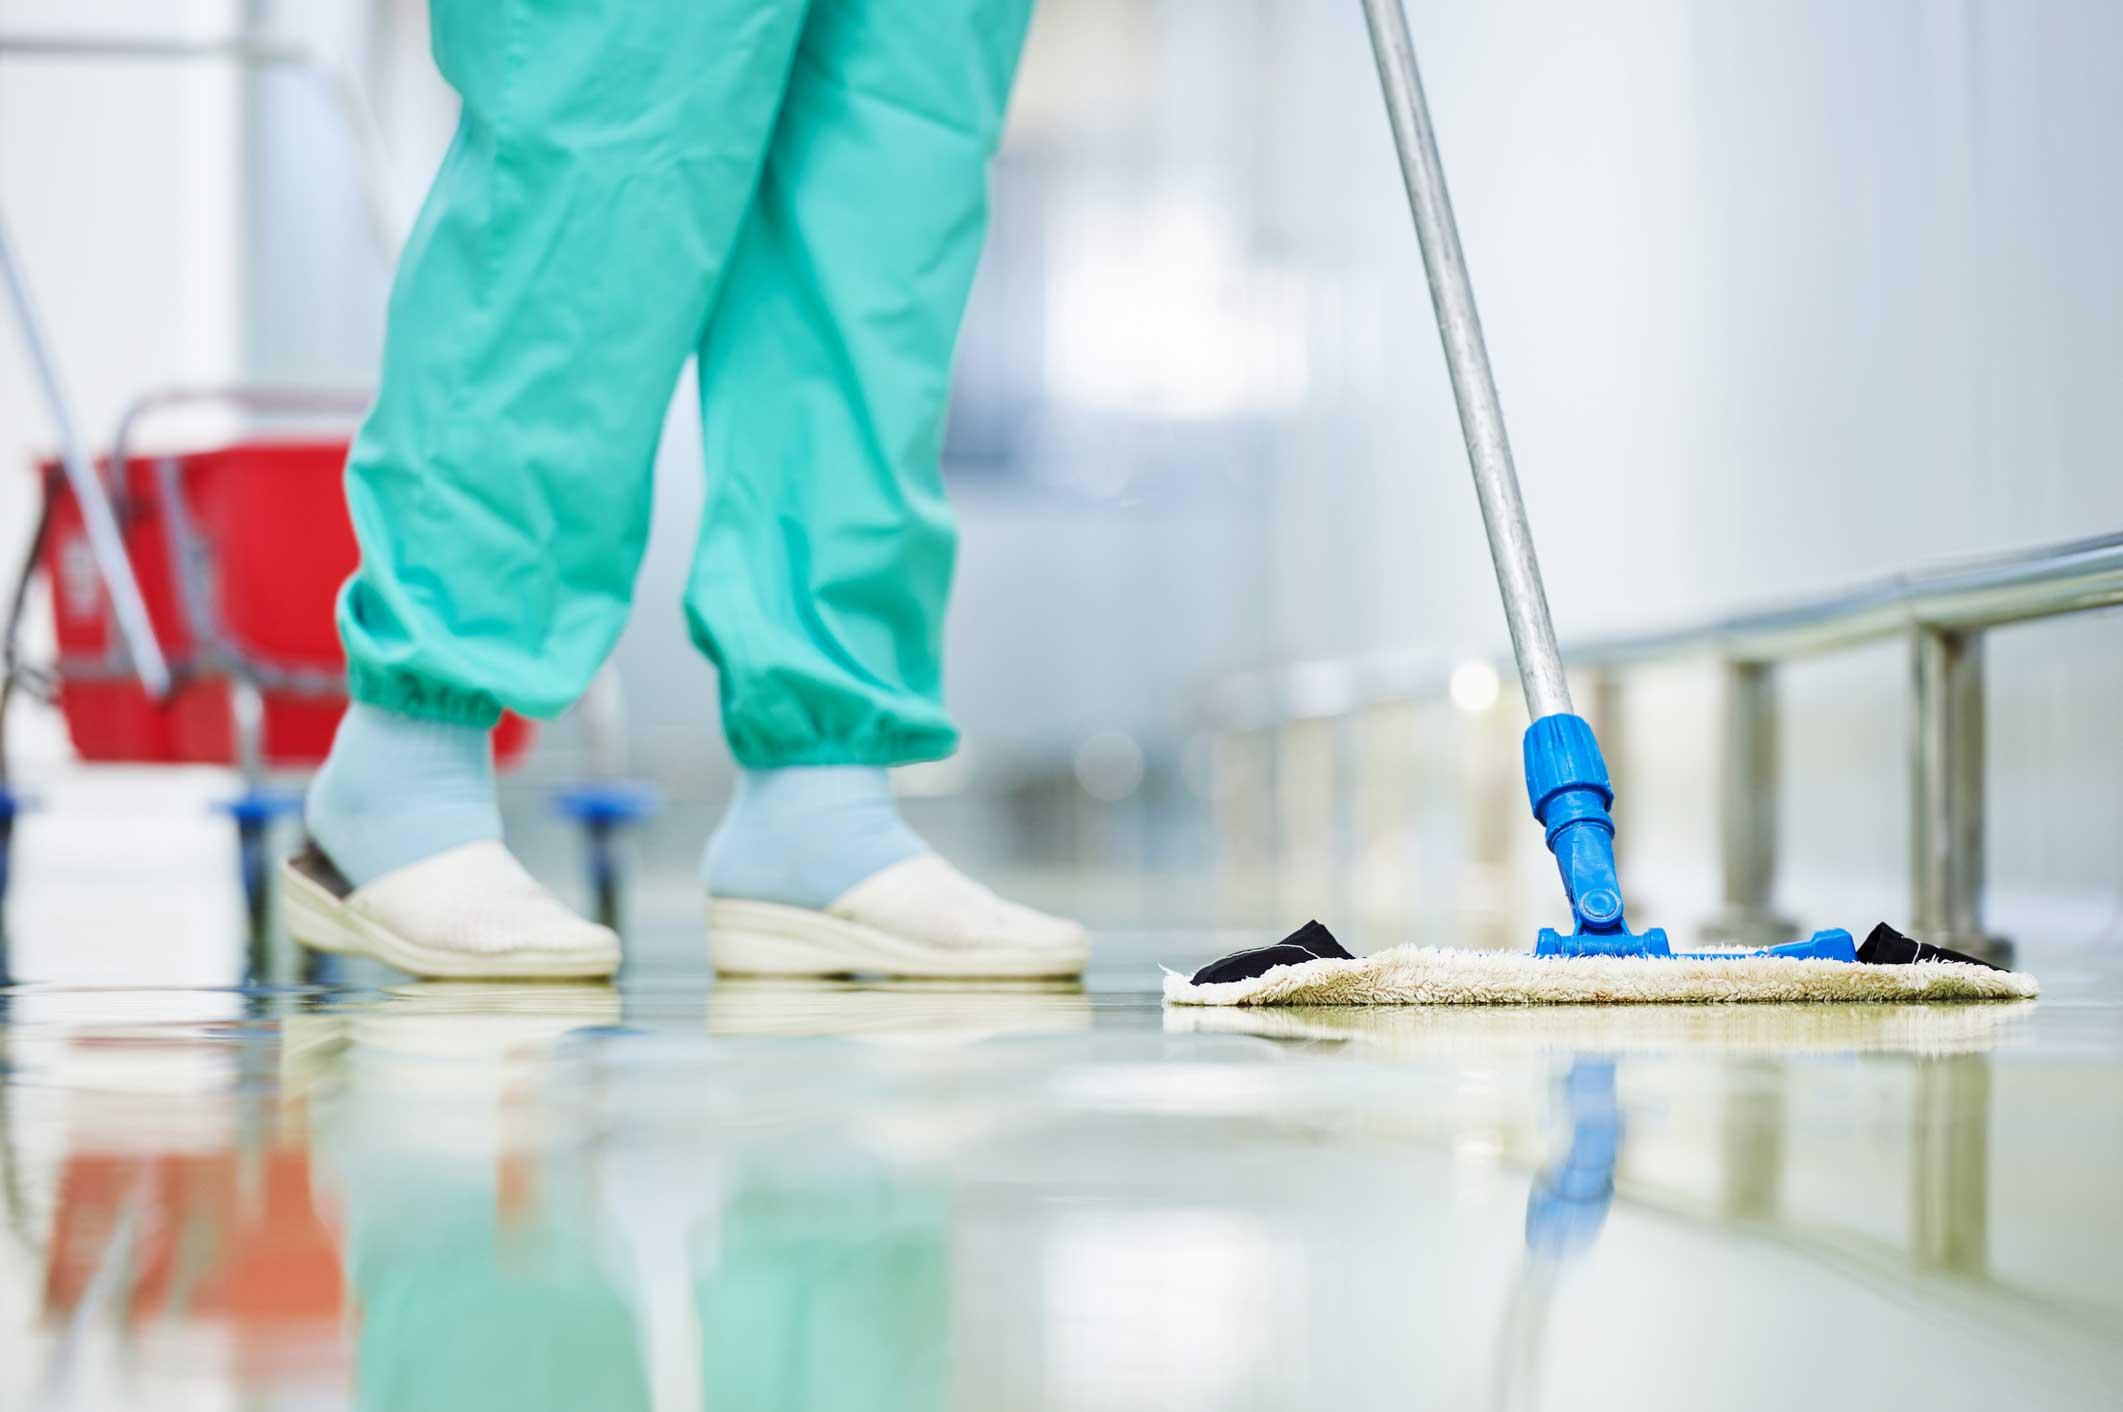 Limpeza Banheiro Hospitalar : Tipos de higieniza??o hospitalar essenciais na limpeza